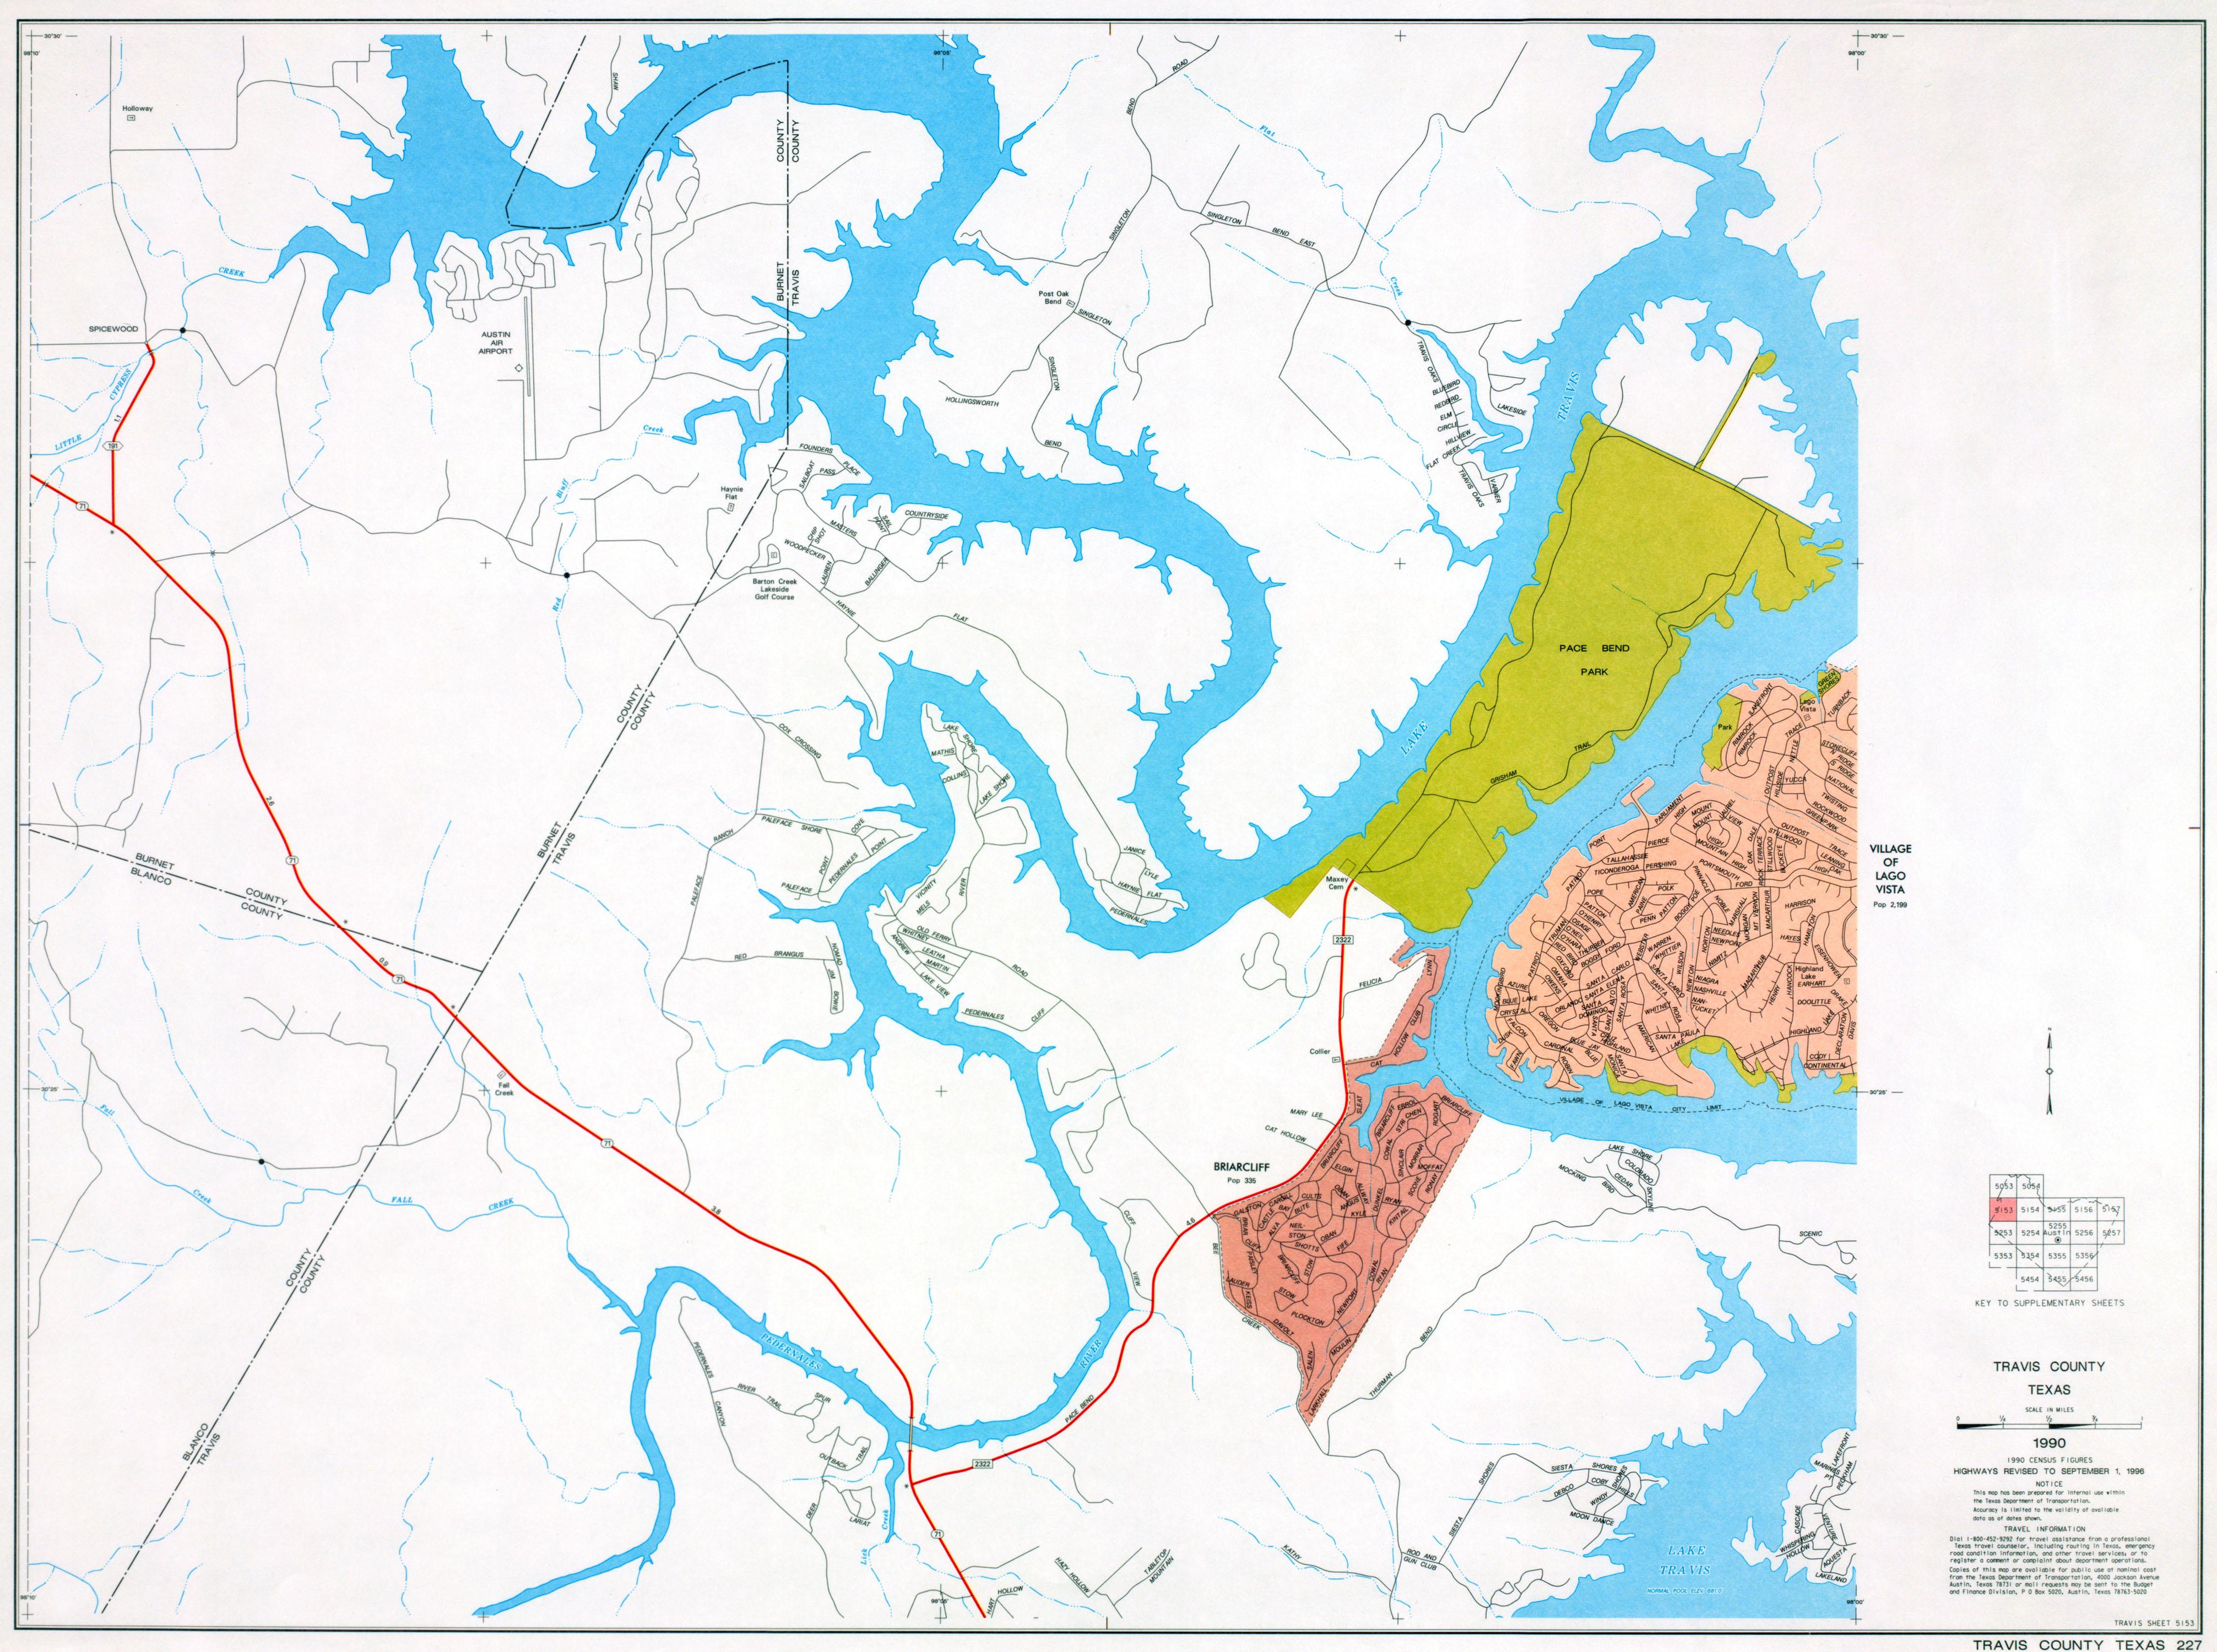 Austin Texas Maps  PerryCastaeda Map Collection  UT